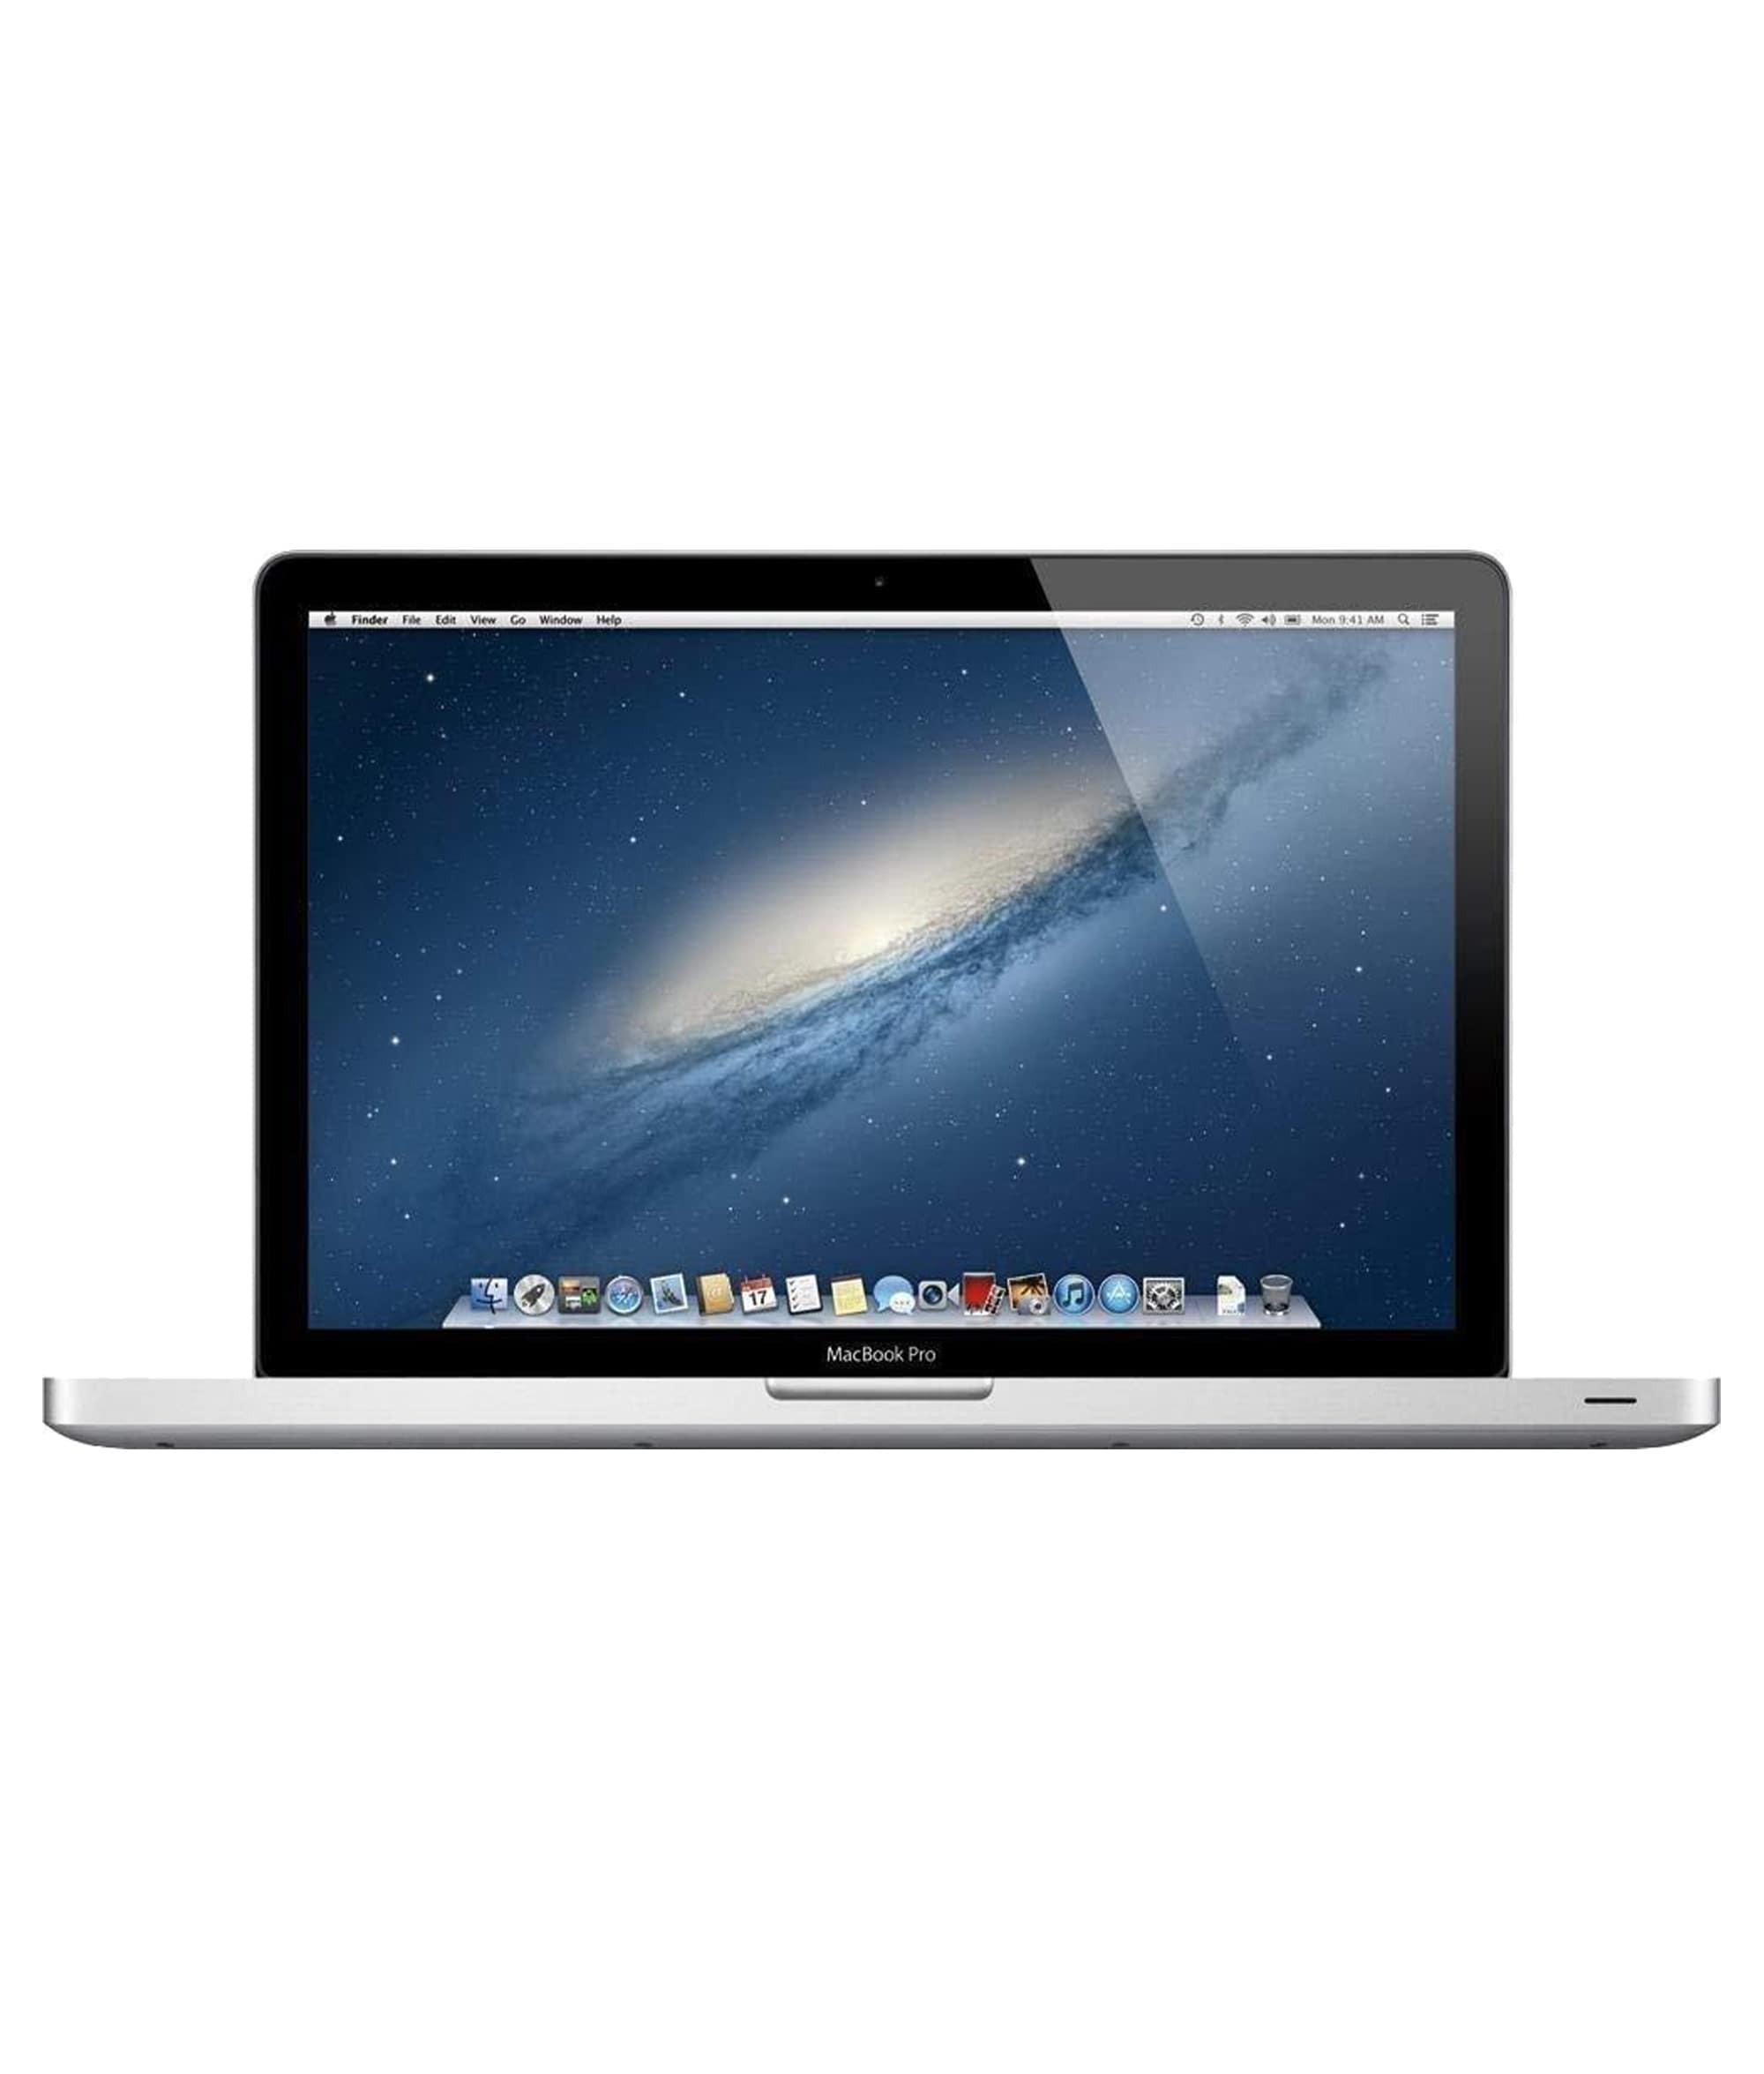 Vendere-Valutare-MacBook Pro Unibody 15 pollici